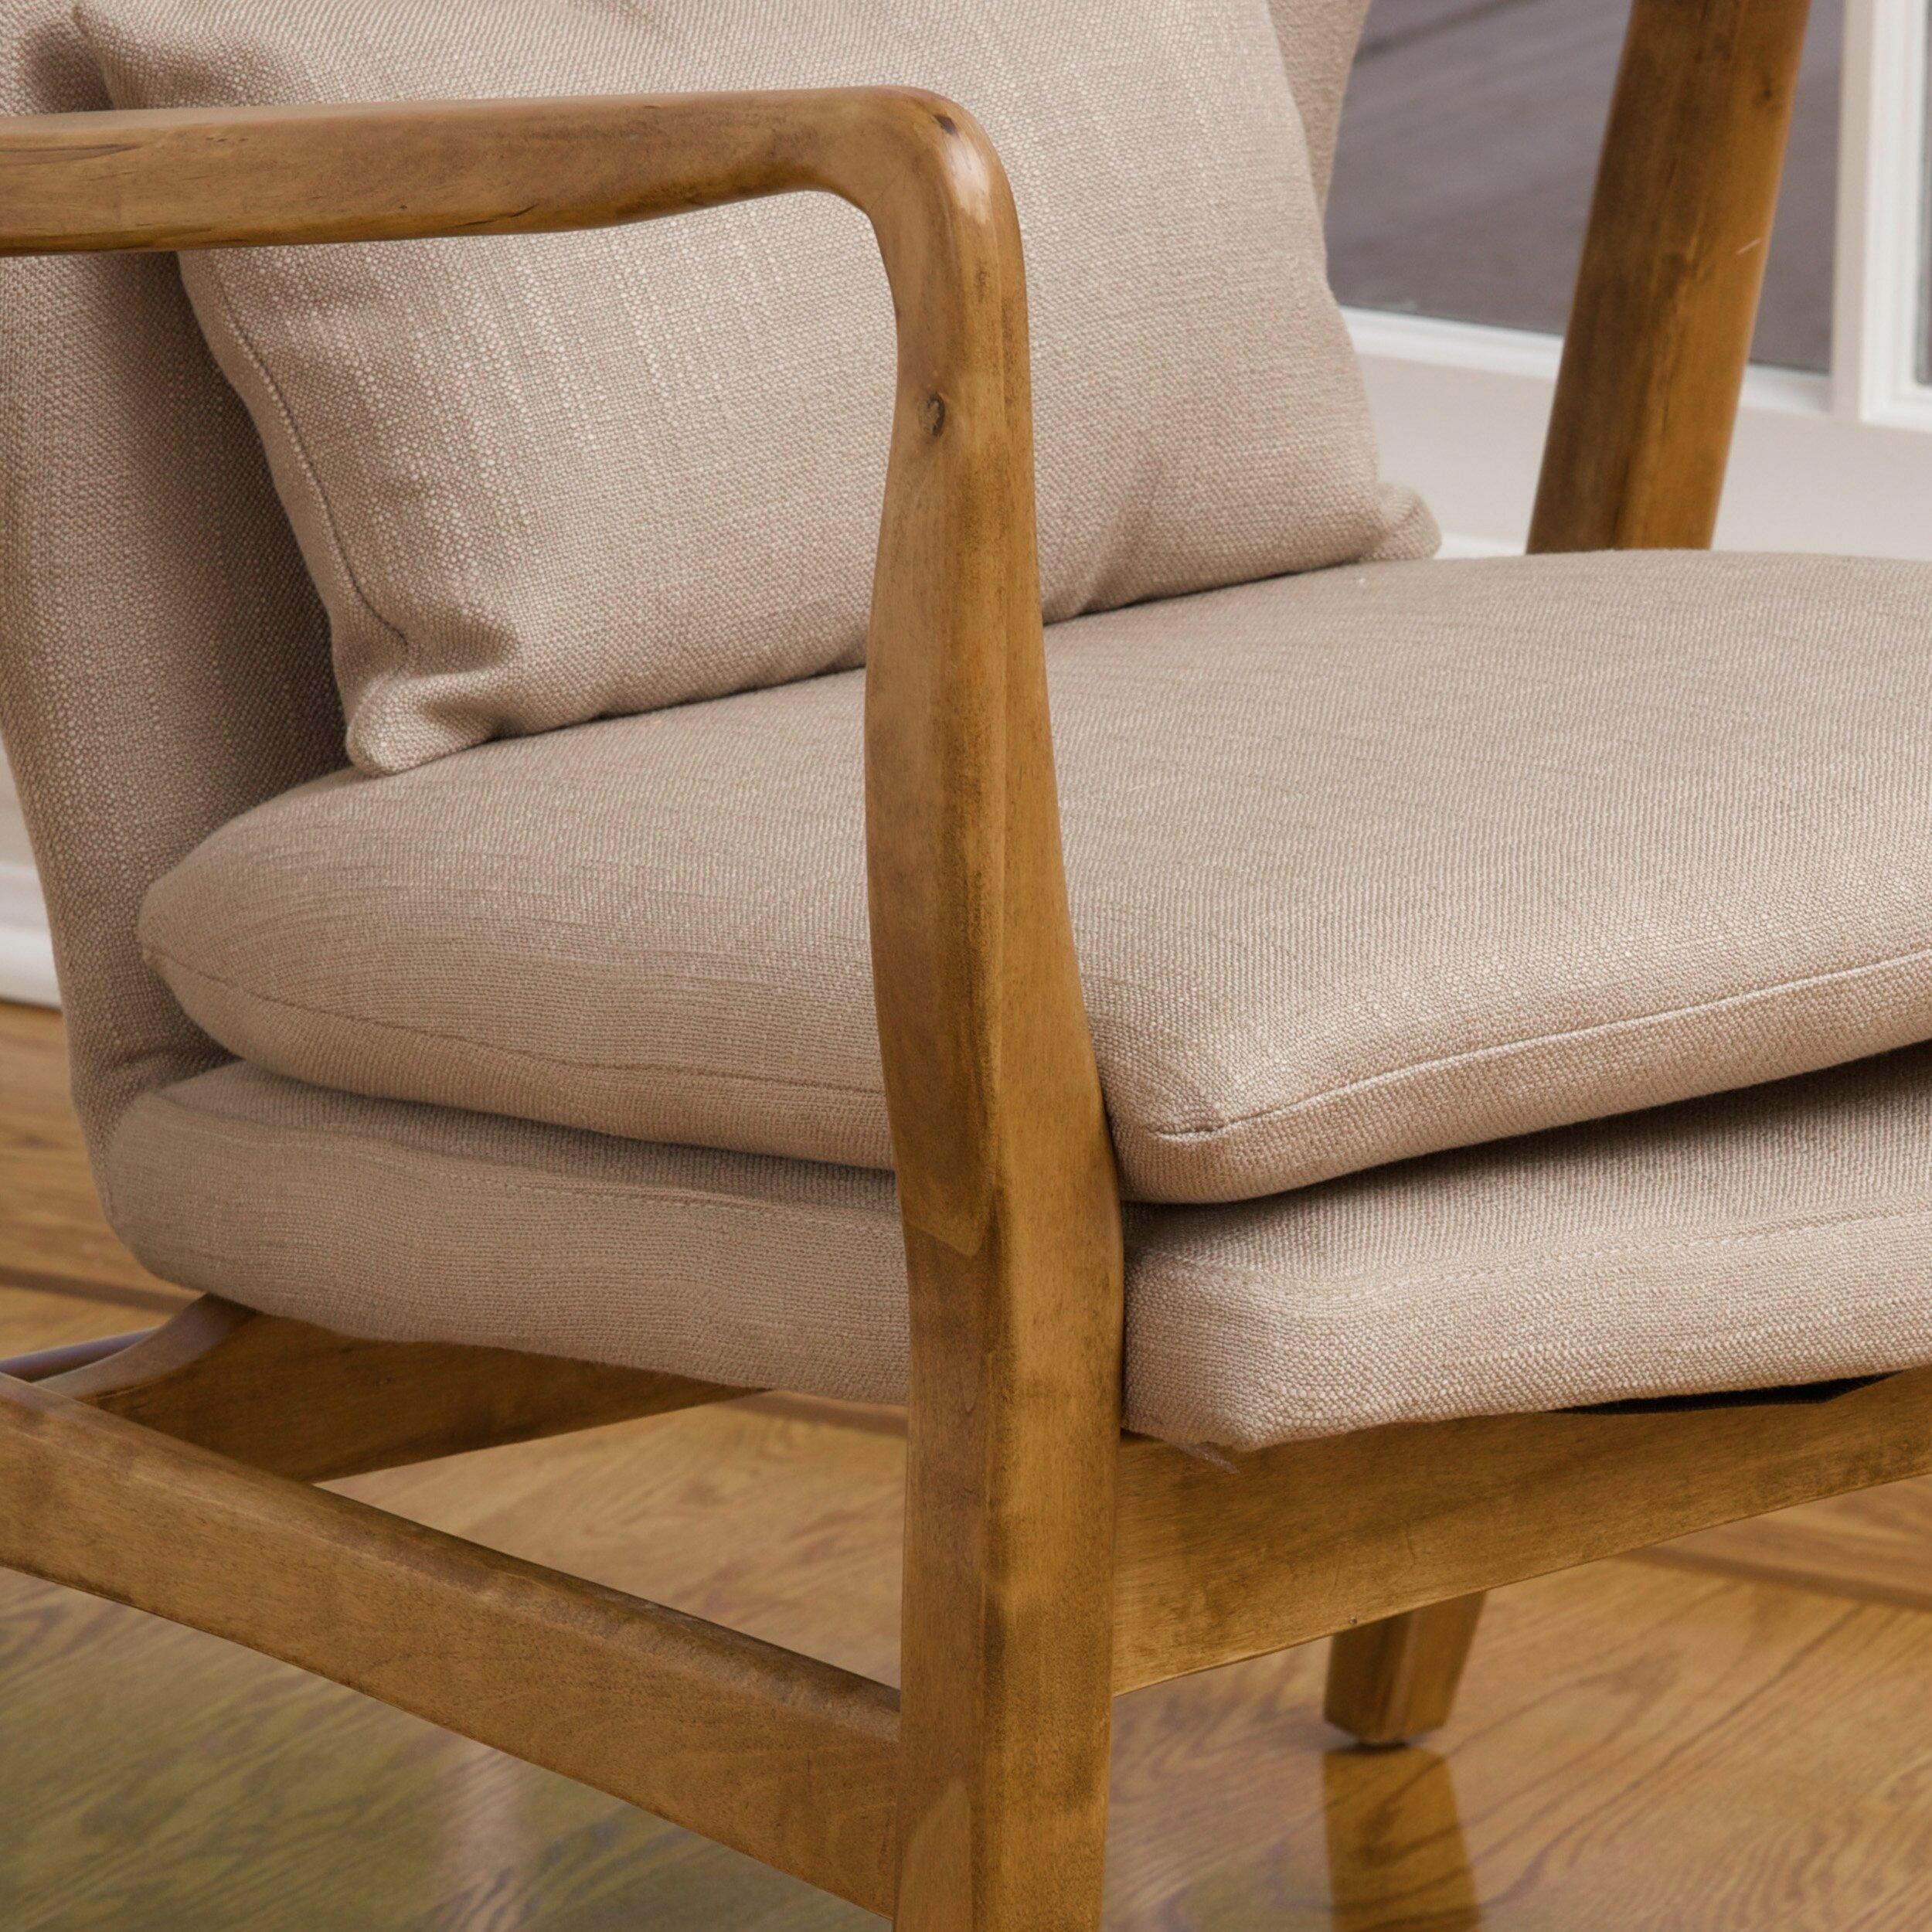 home loft concepts isabella accent arm chair  reviews  wayfair - home loft concepts isabella accent arm chair